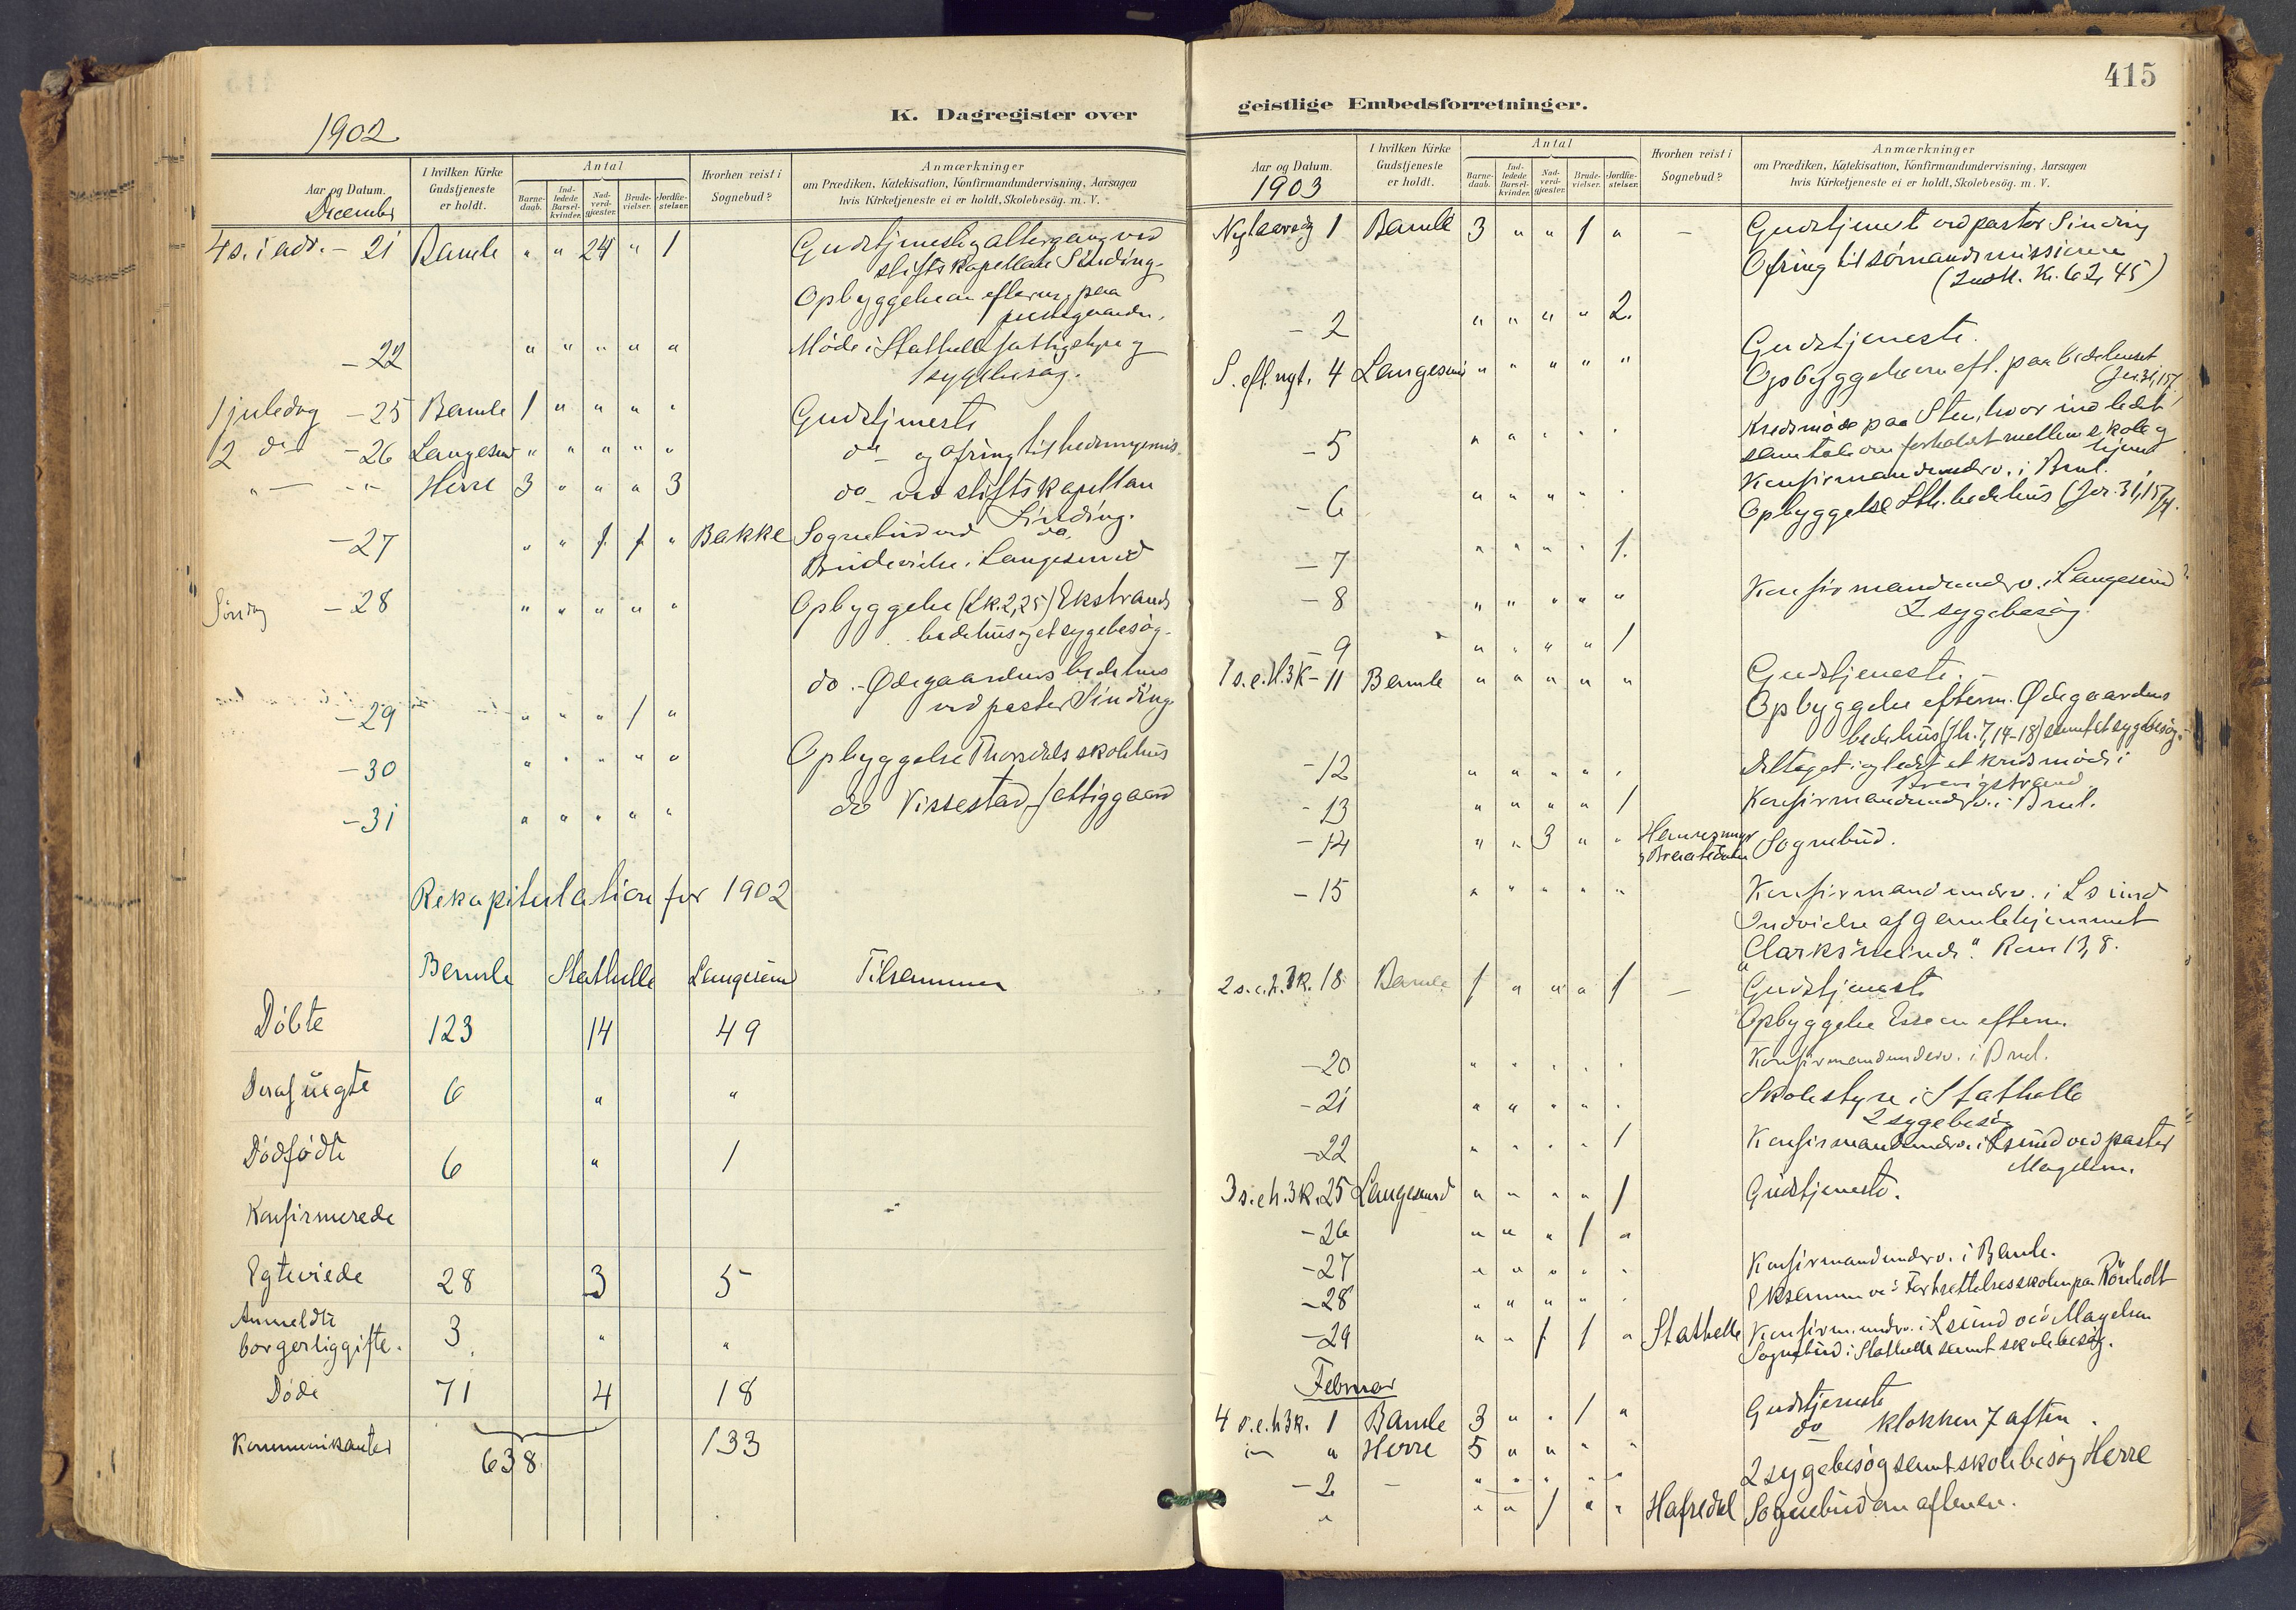 SAKO, Bamble kirkebøker, F/Fa/L0009: Ministerialbok nr. I 9, 1901-1917, s. 415